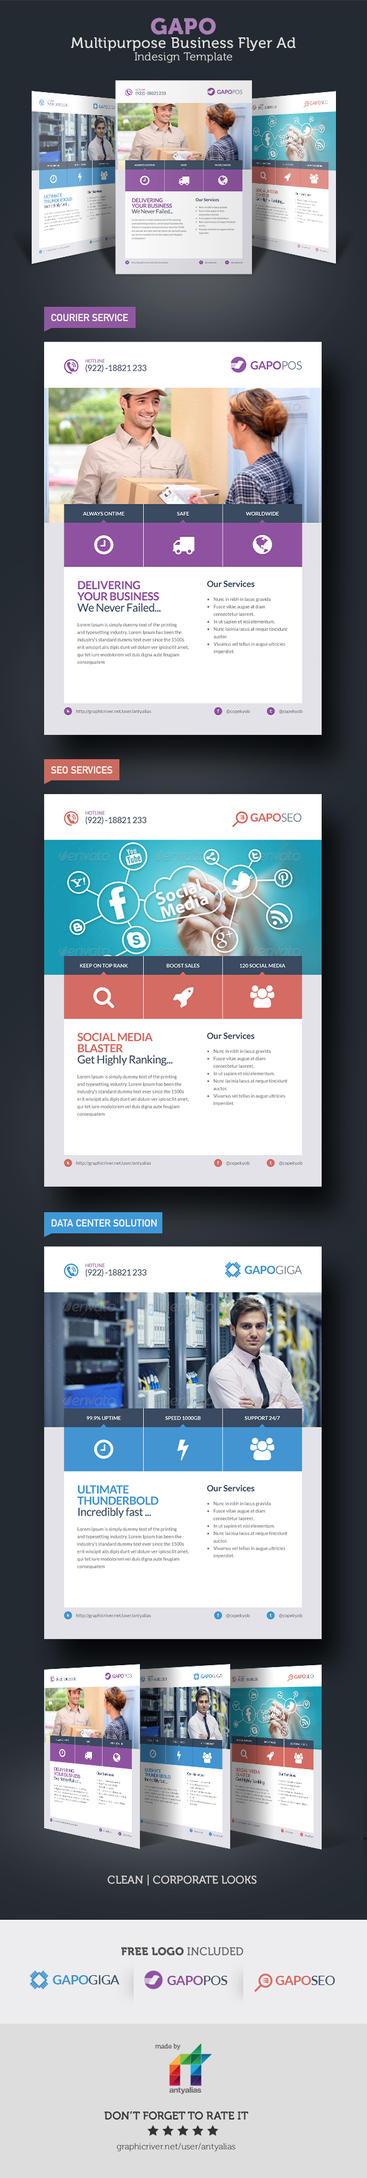 GAPO Multipurpose Business Flyer Ad by antyalias